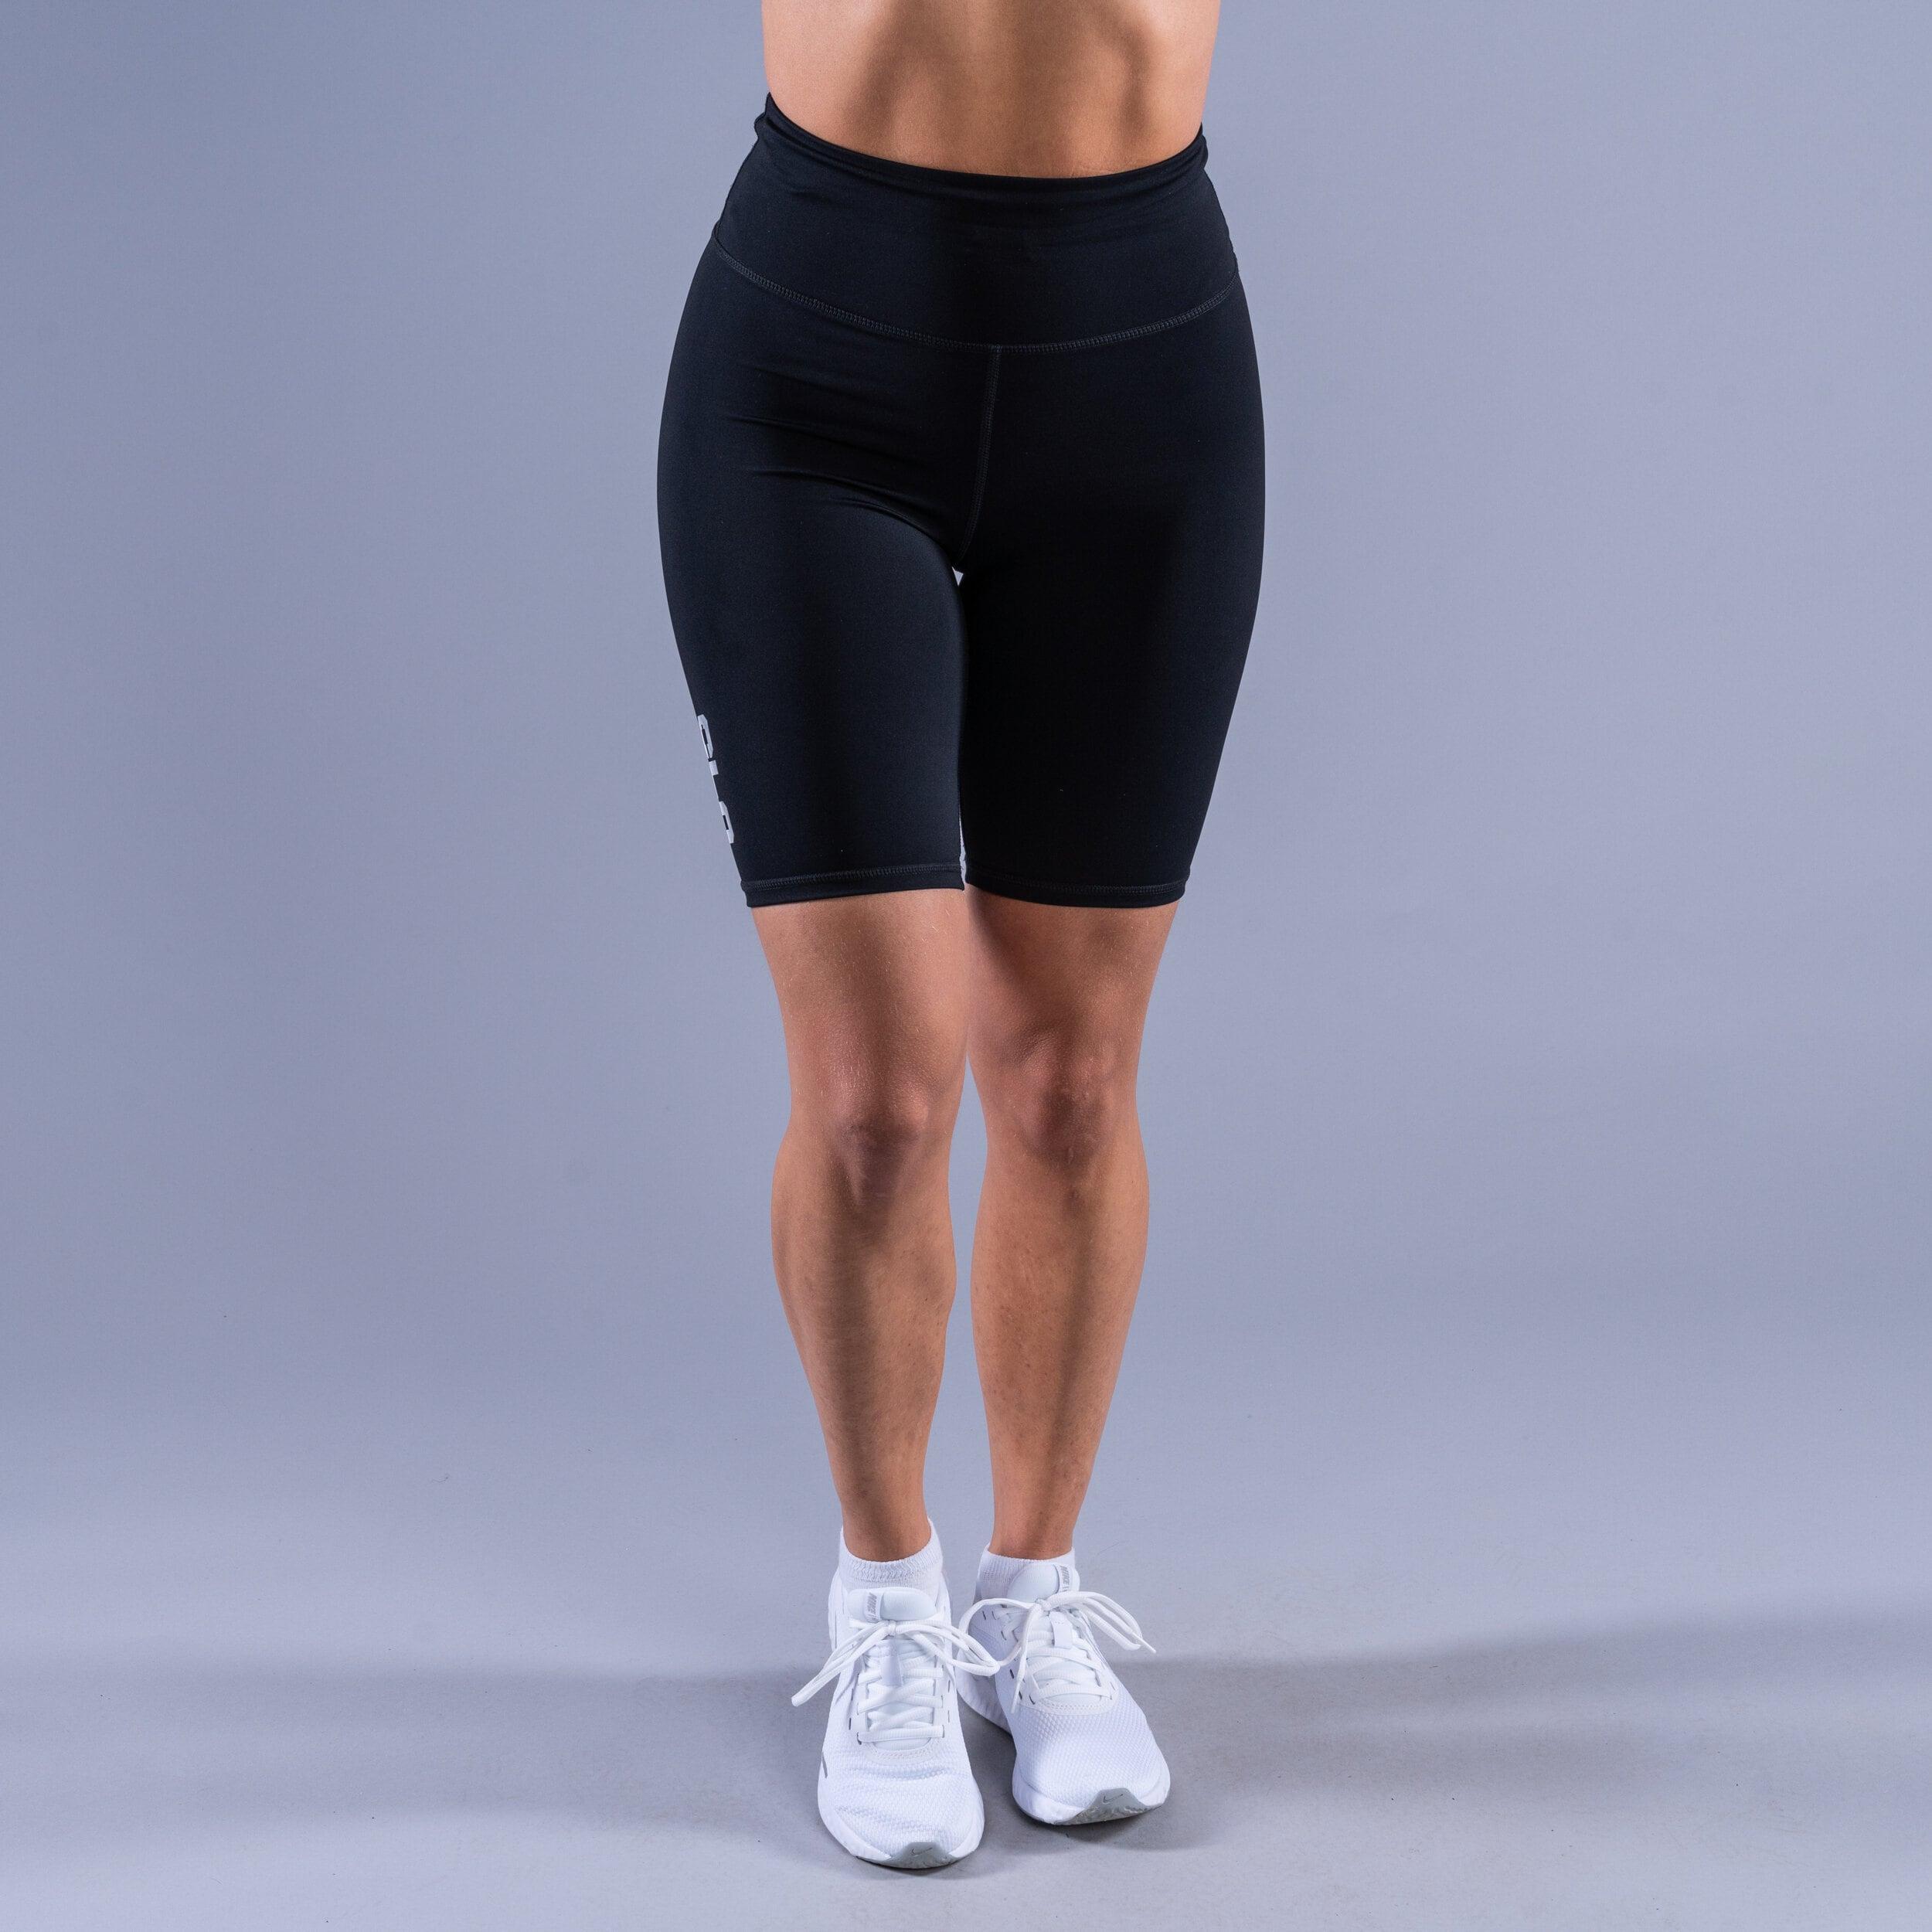 CLN Bike ws shorts Black